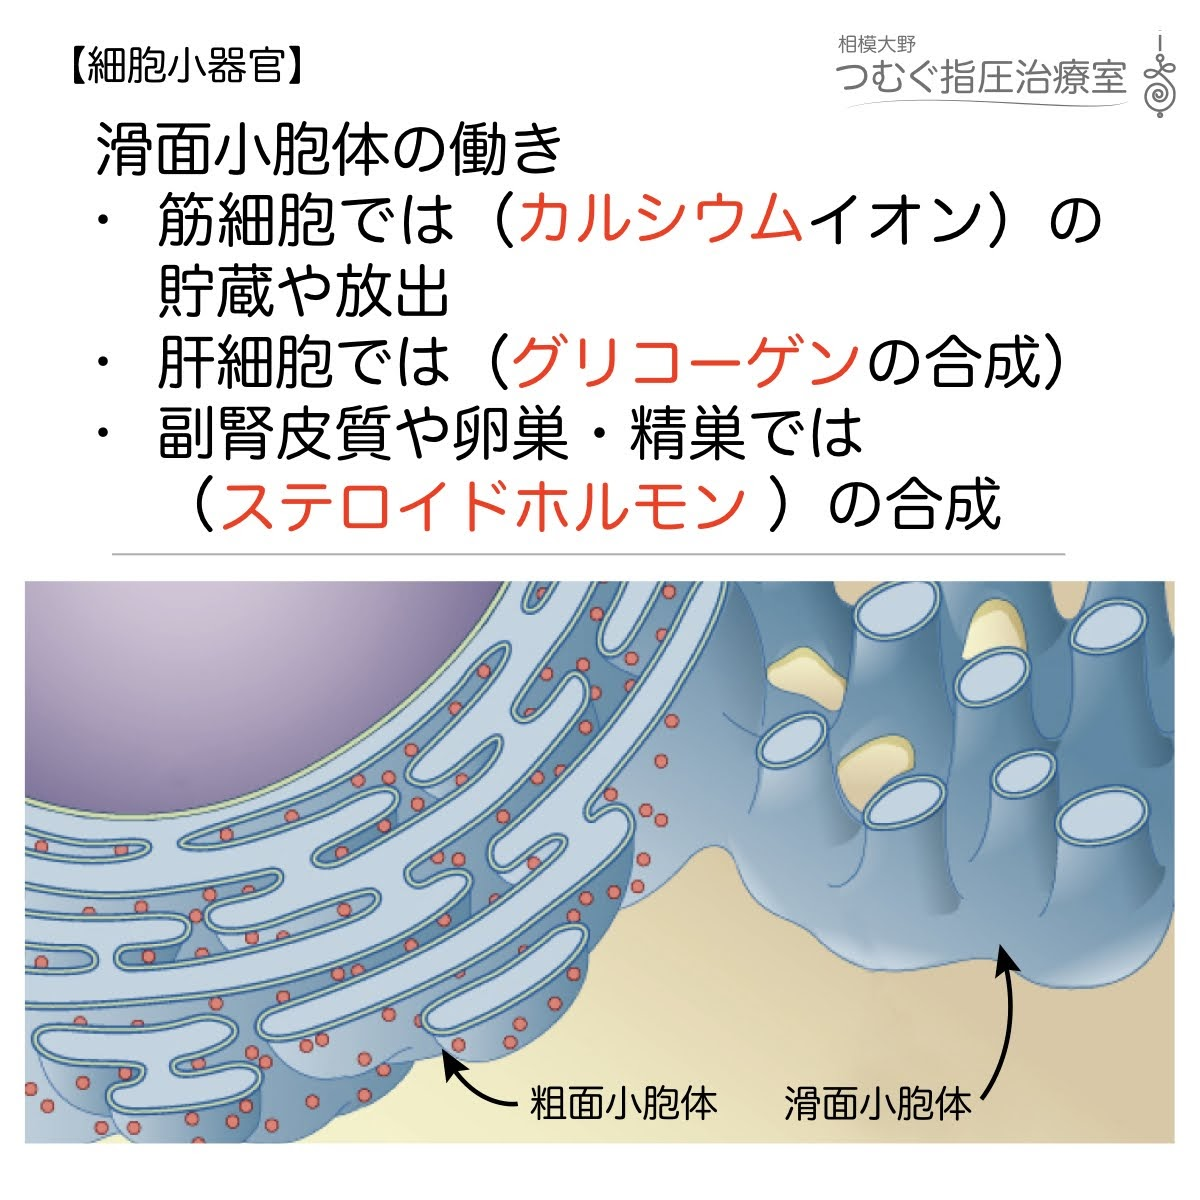 滑面小胞体の働き:筋細胞、肝細胞、副腎皮質・精巣・卵巣